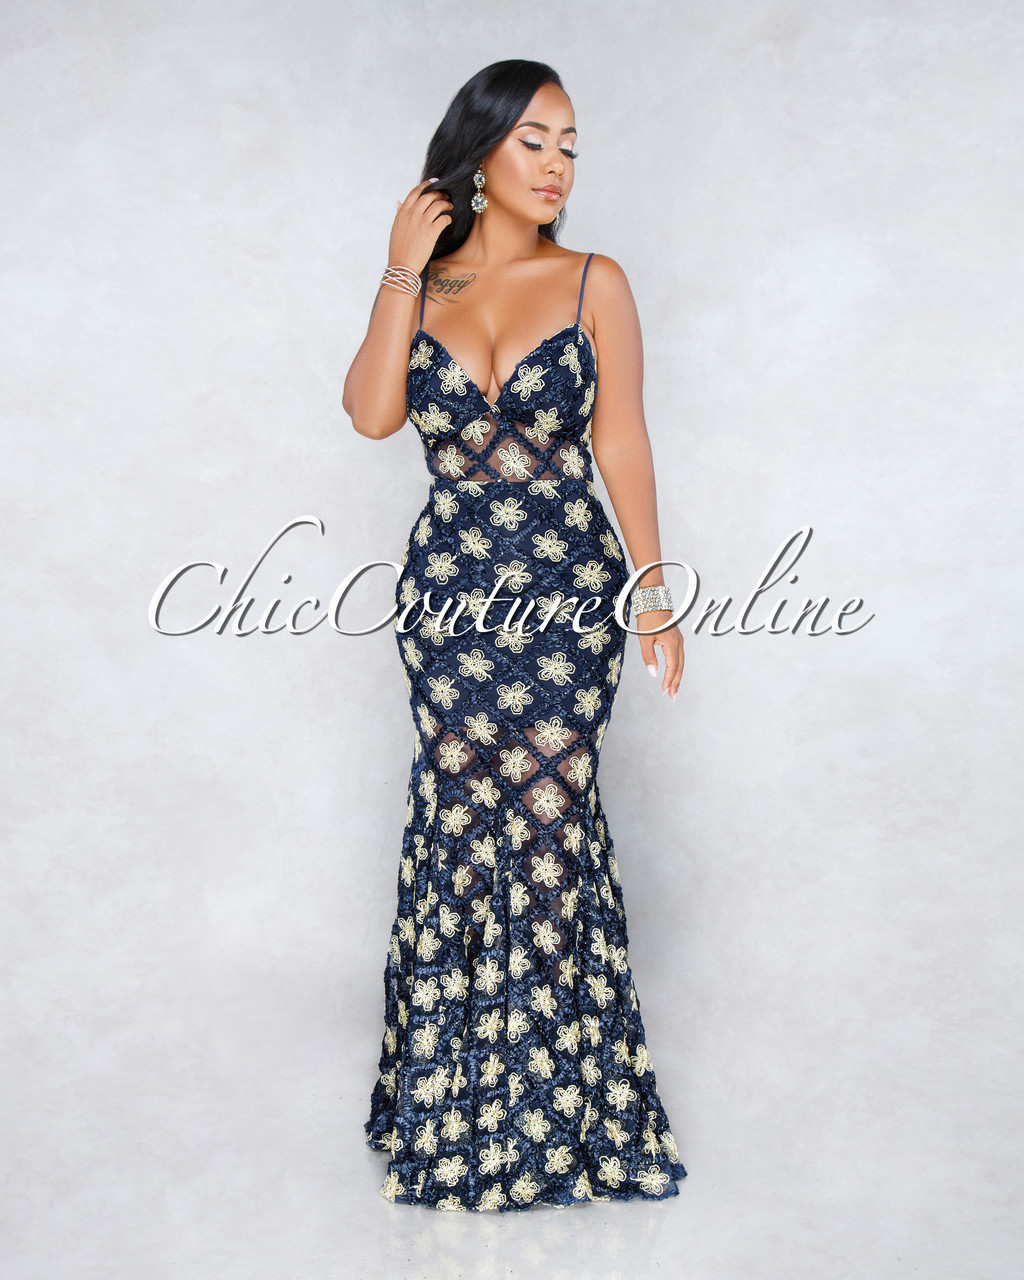 9a3b8ec5f6d13 Badell Navy Blue Gold Embroidery Mesh Mermaid Dress